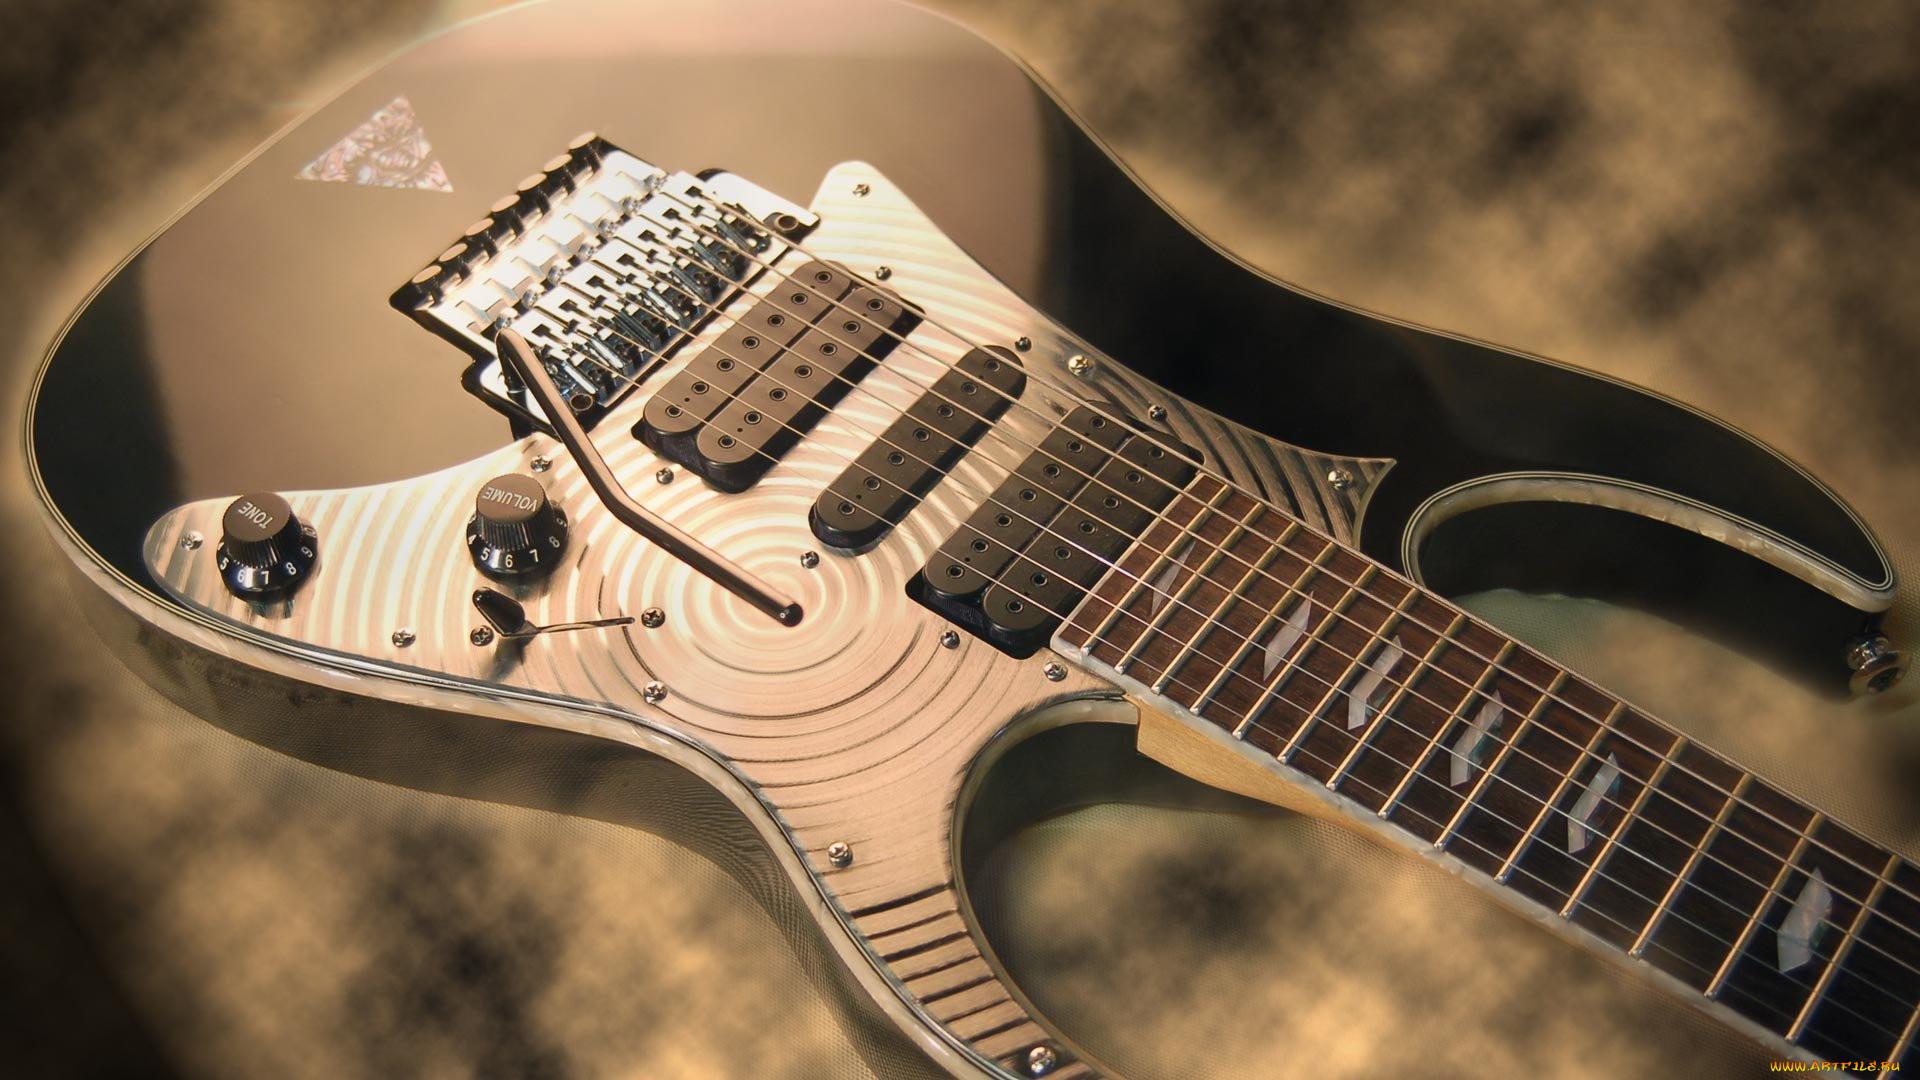 картинки рок гитара на рабочий стол элисон сотрудничает